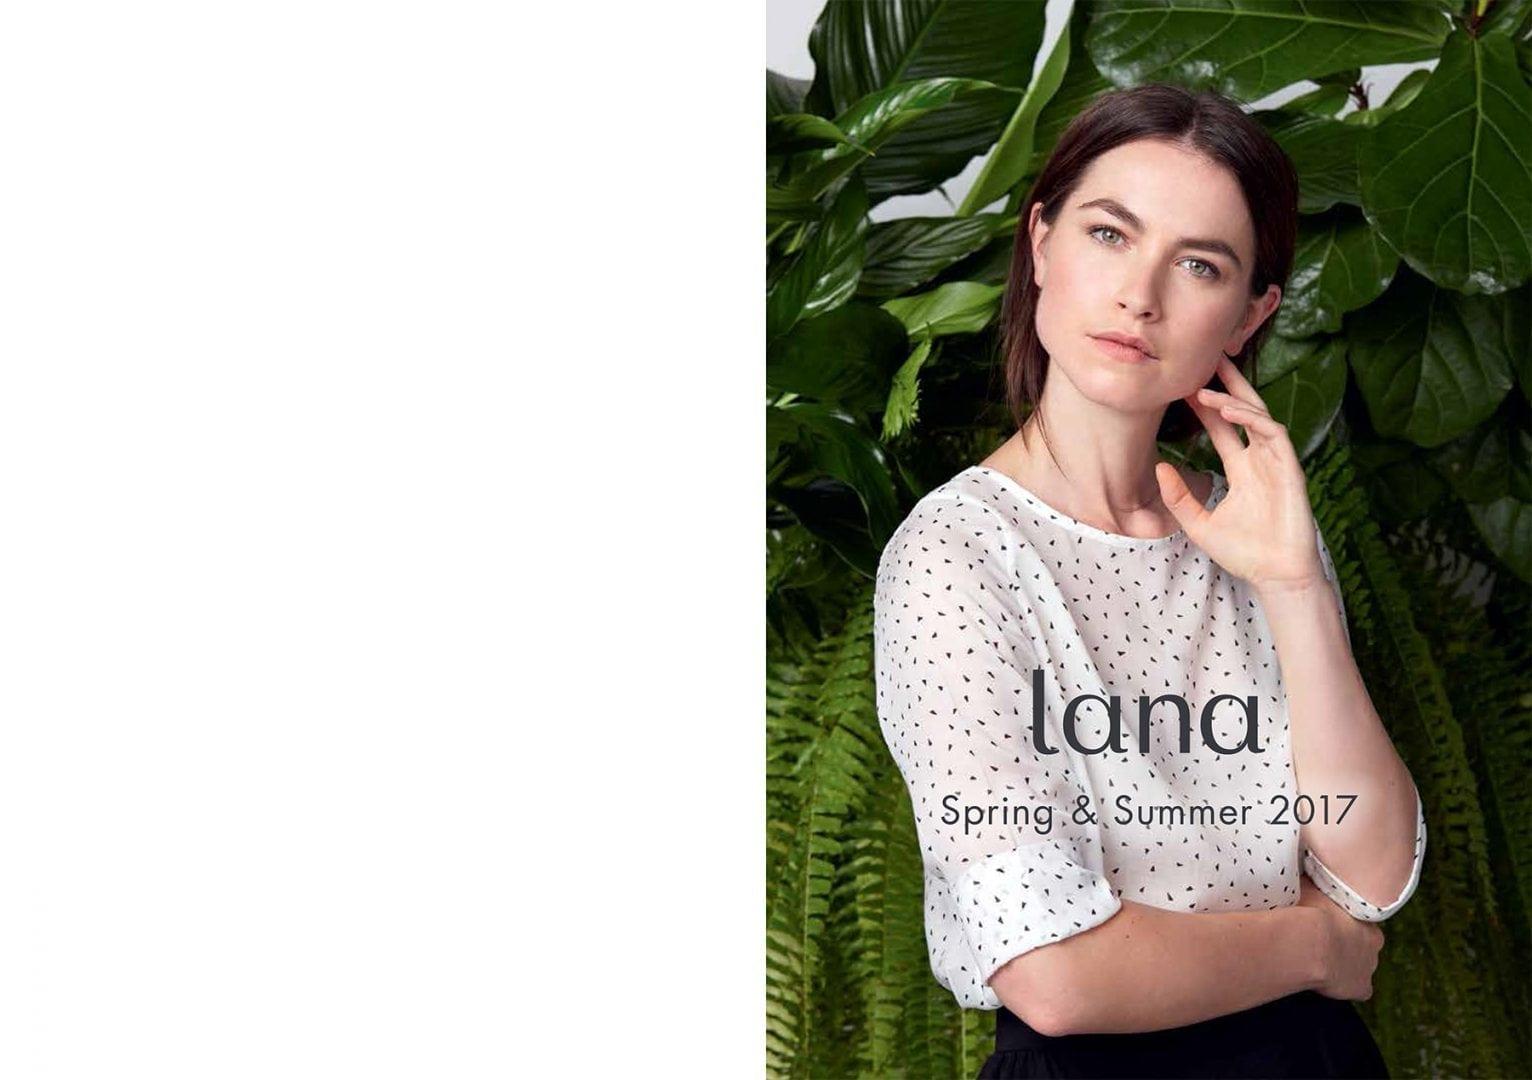 LANA_DOB_SS_2017_195x275mm_lr-1